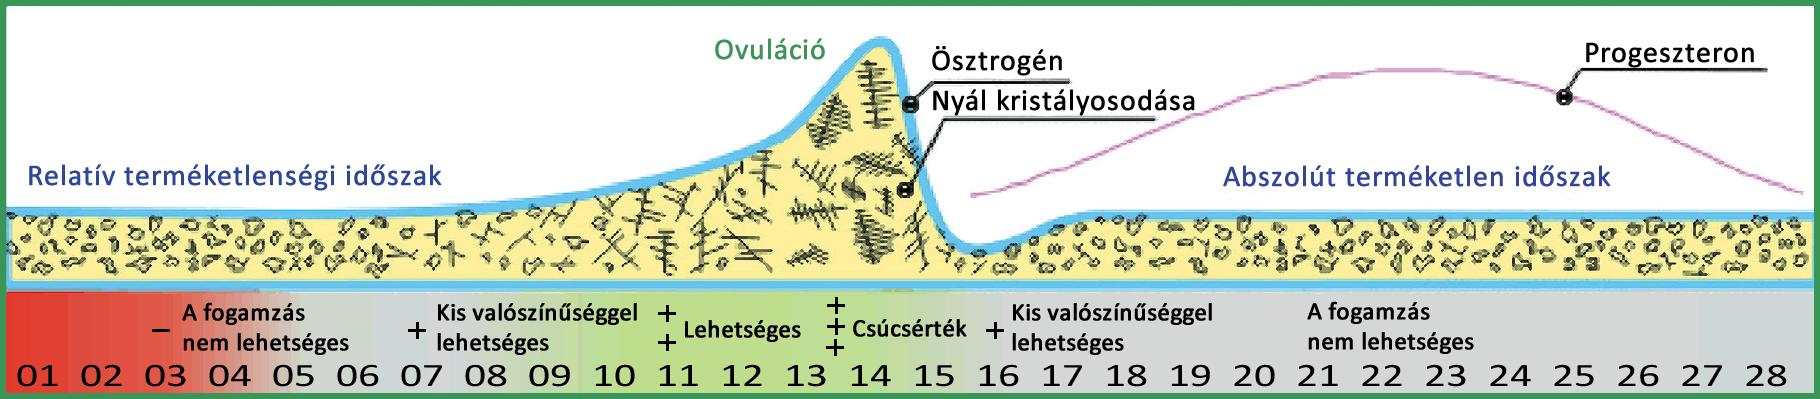 menstruációs ciklus DONNA ovulációs mikroszkóp